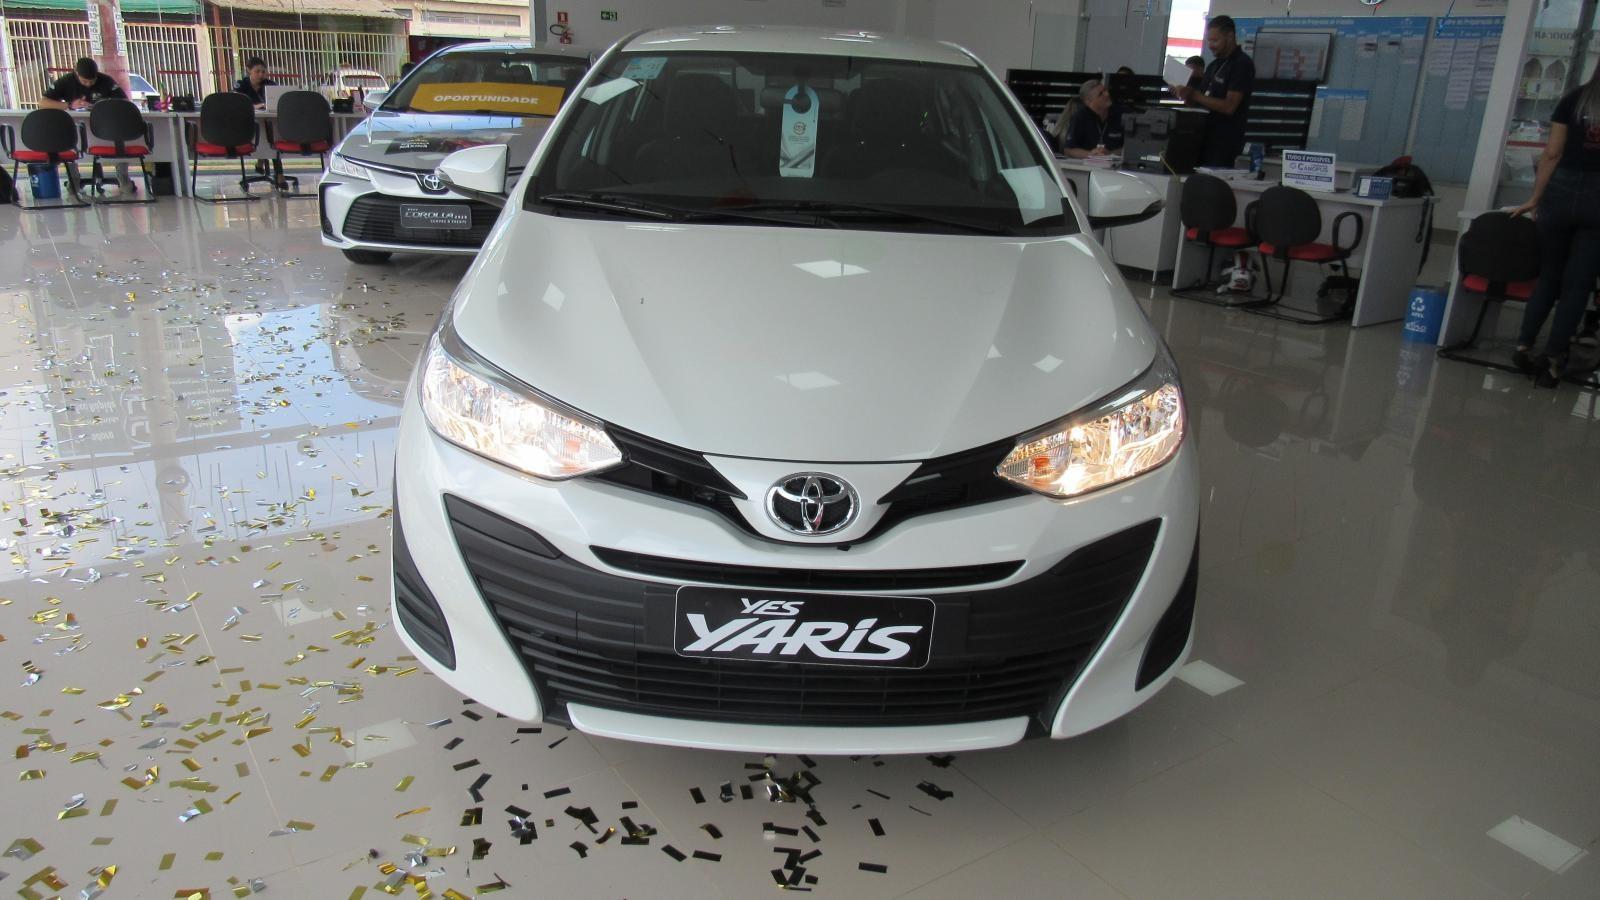 //www.autoline.com.br/carro/toyota/yaris-15-xl-16v-sedan-flex-4p-manual/2020/brasilia-df/12330819